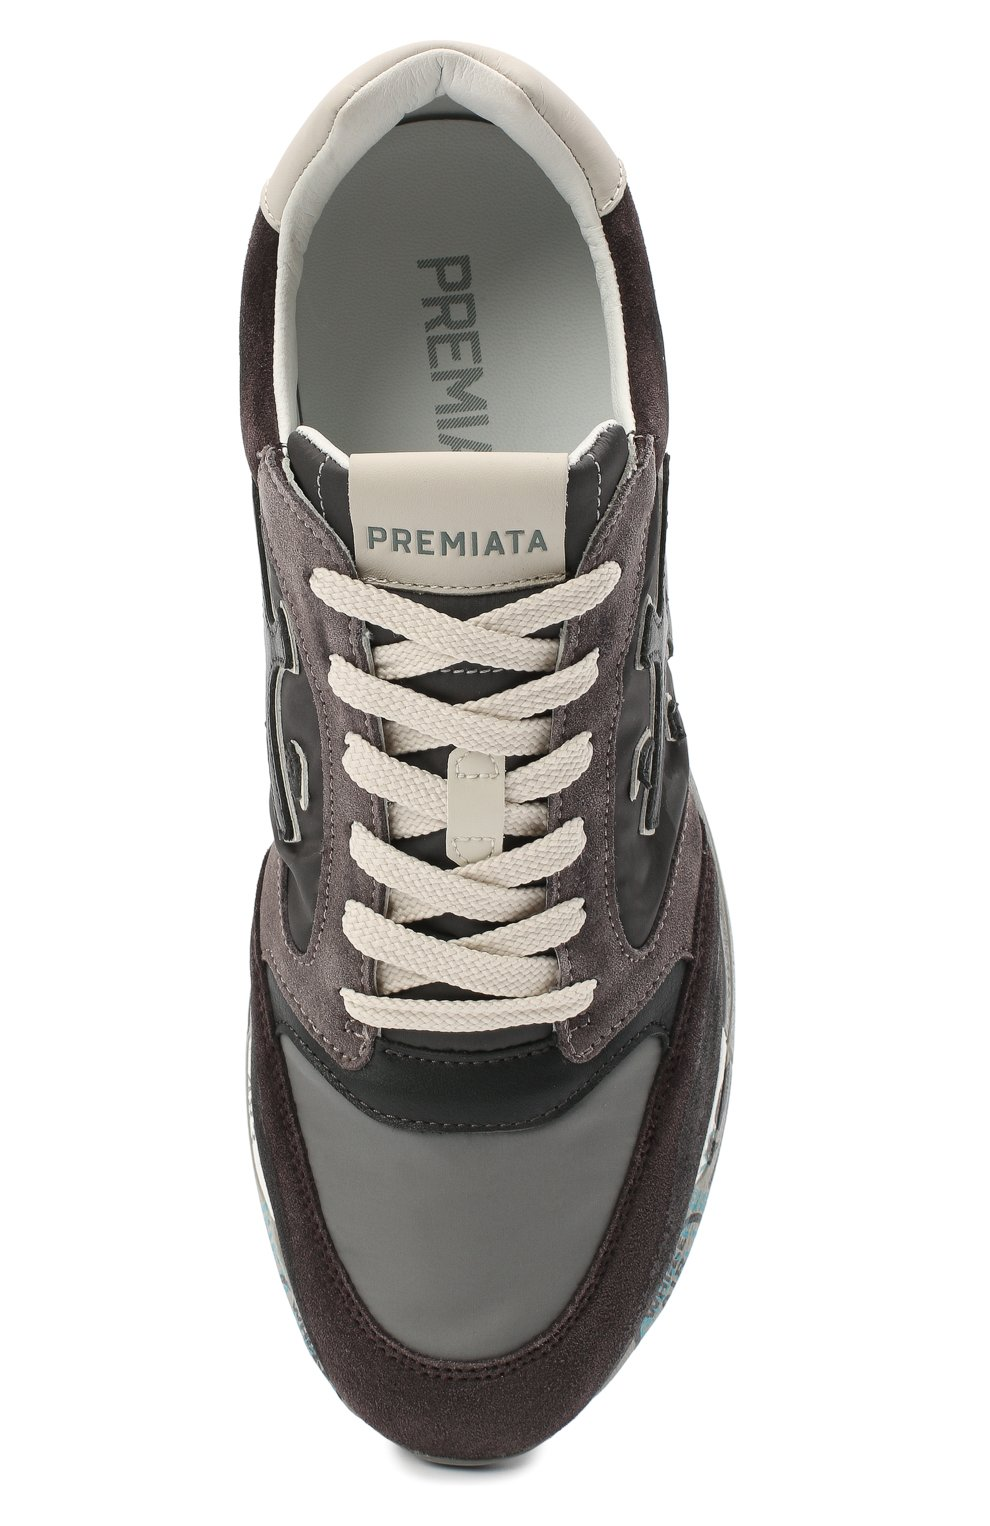 Мужские комбинированные кроссовки zac-zac PREMIATA серого цвета, арт. ZAC-ZAC/VAR3547 | Фото 5